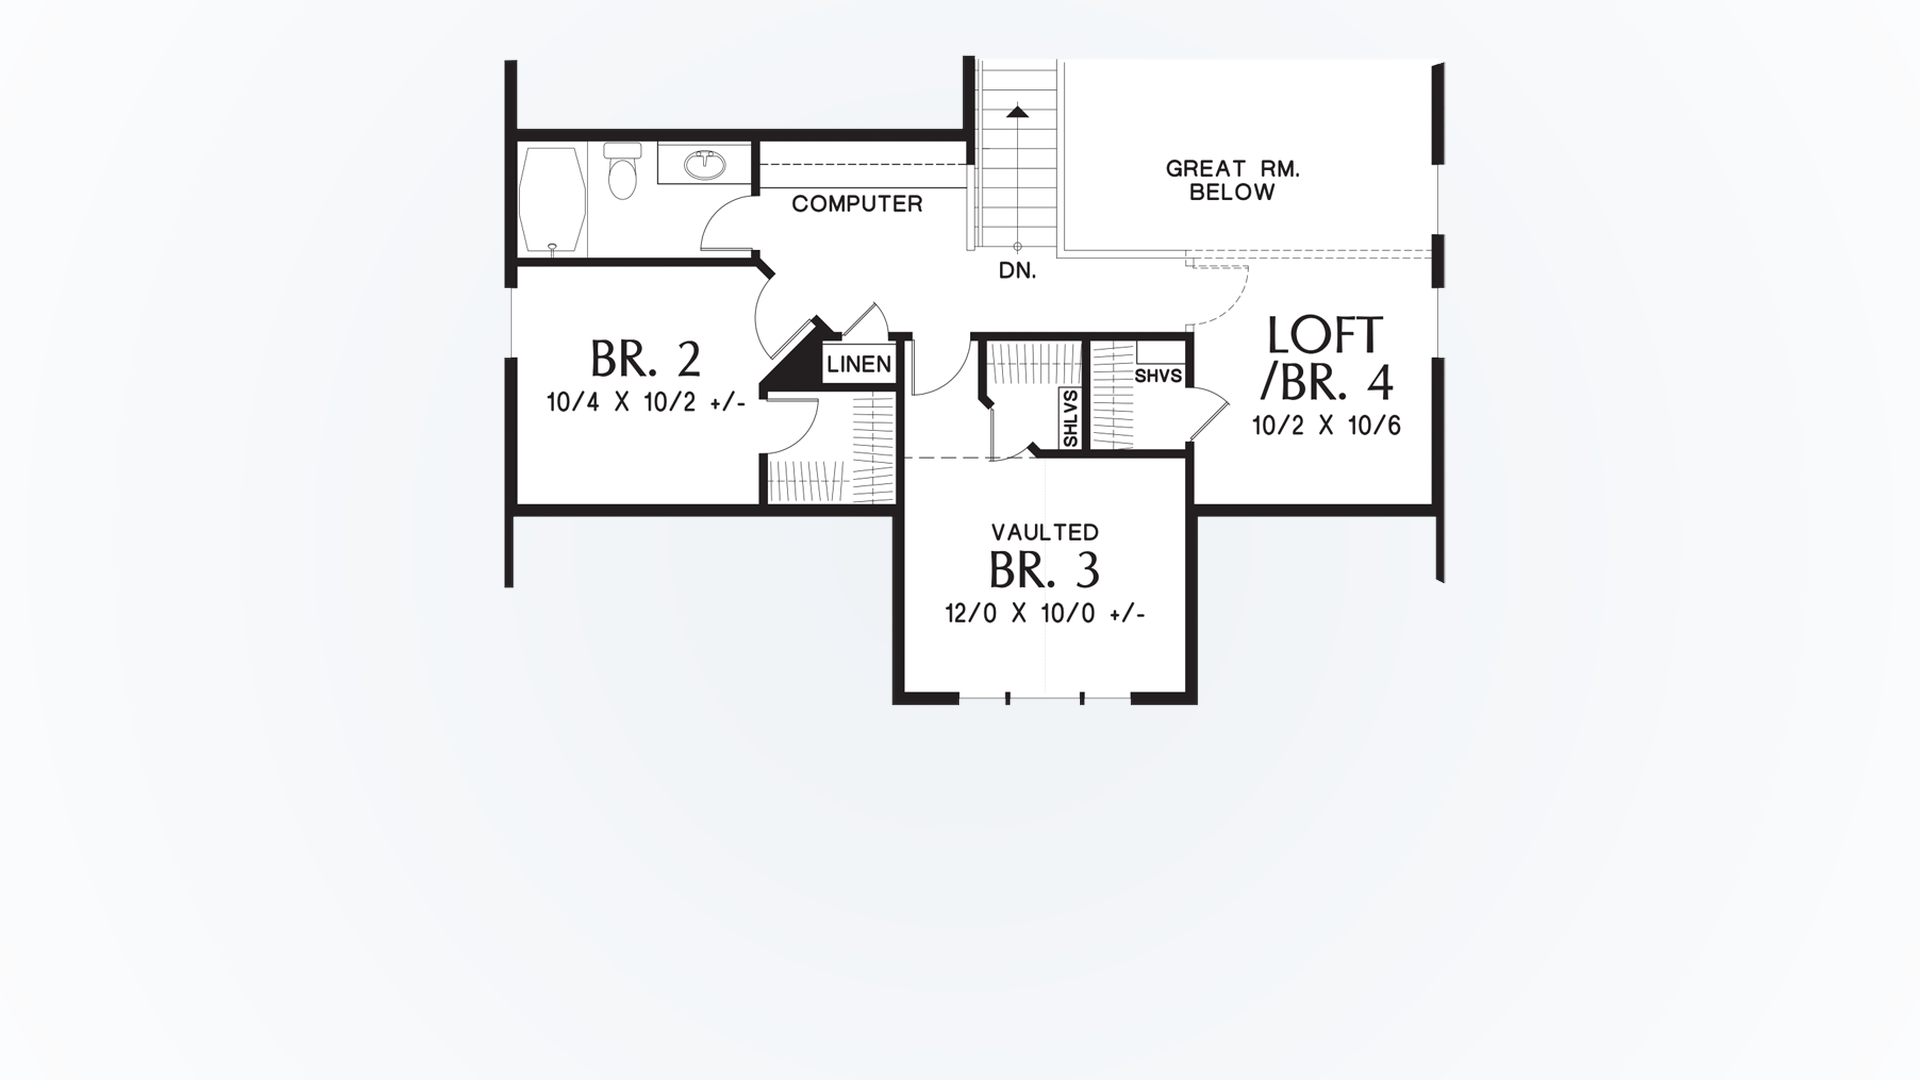 house floor plan mascord ton ranch home plans custom main floor plan of mascord plan 2469 the tualatin